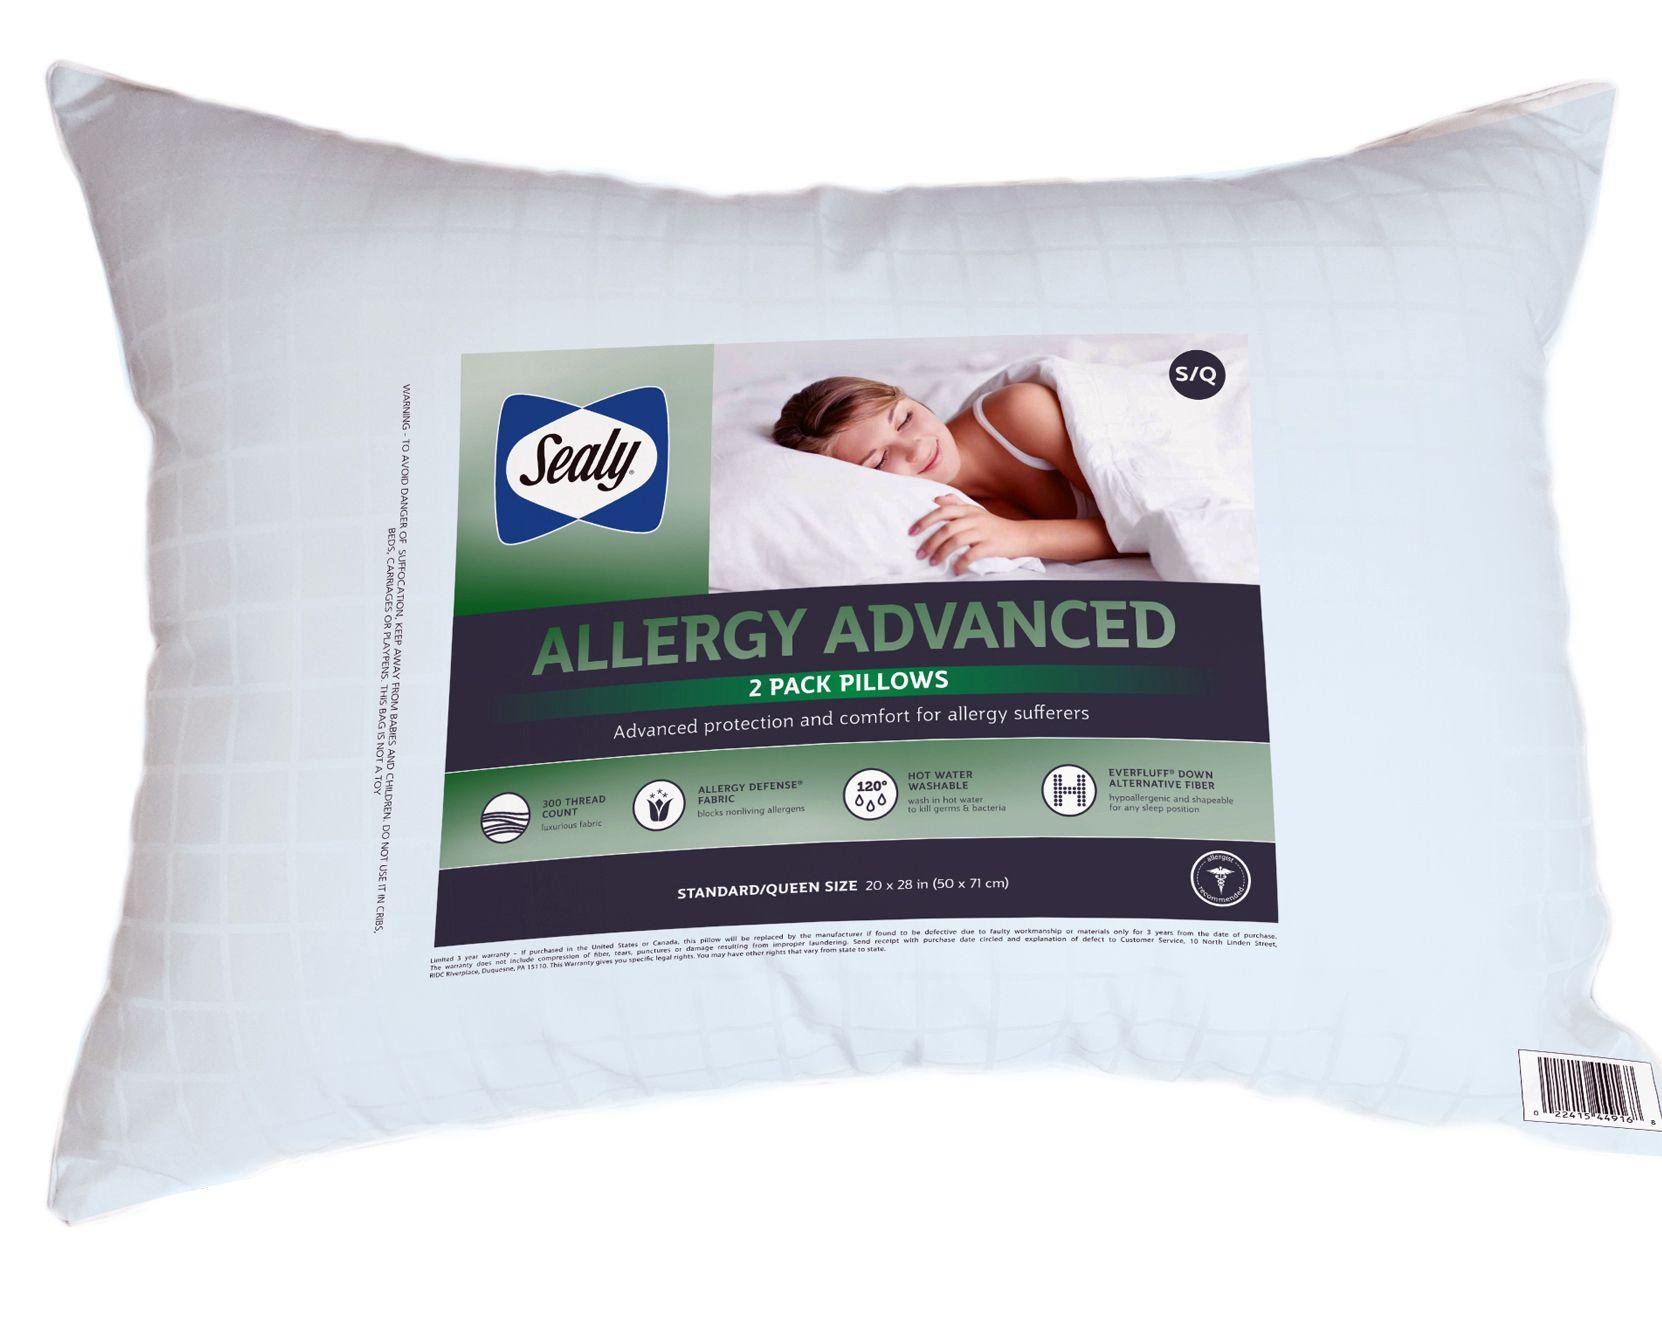 sealy allergy advanced standard size pillows 2 pk walmart com